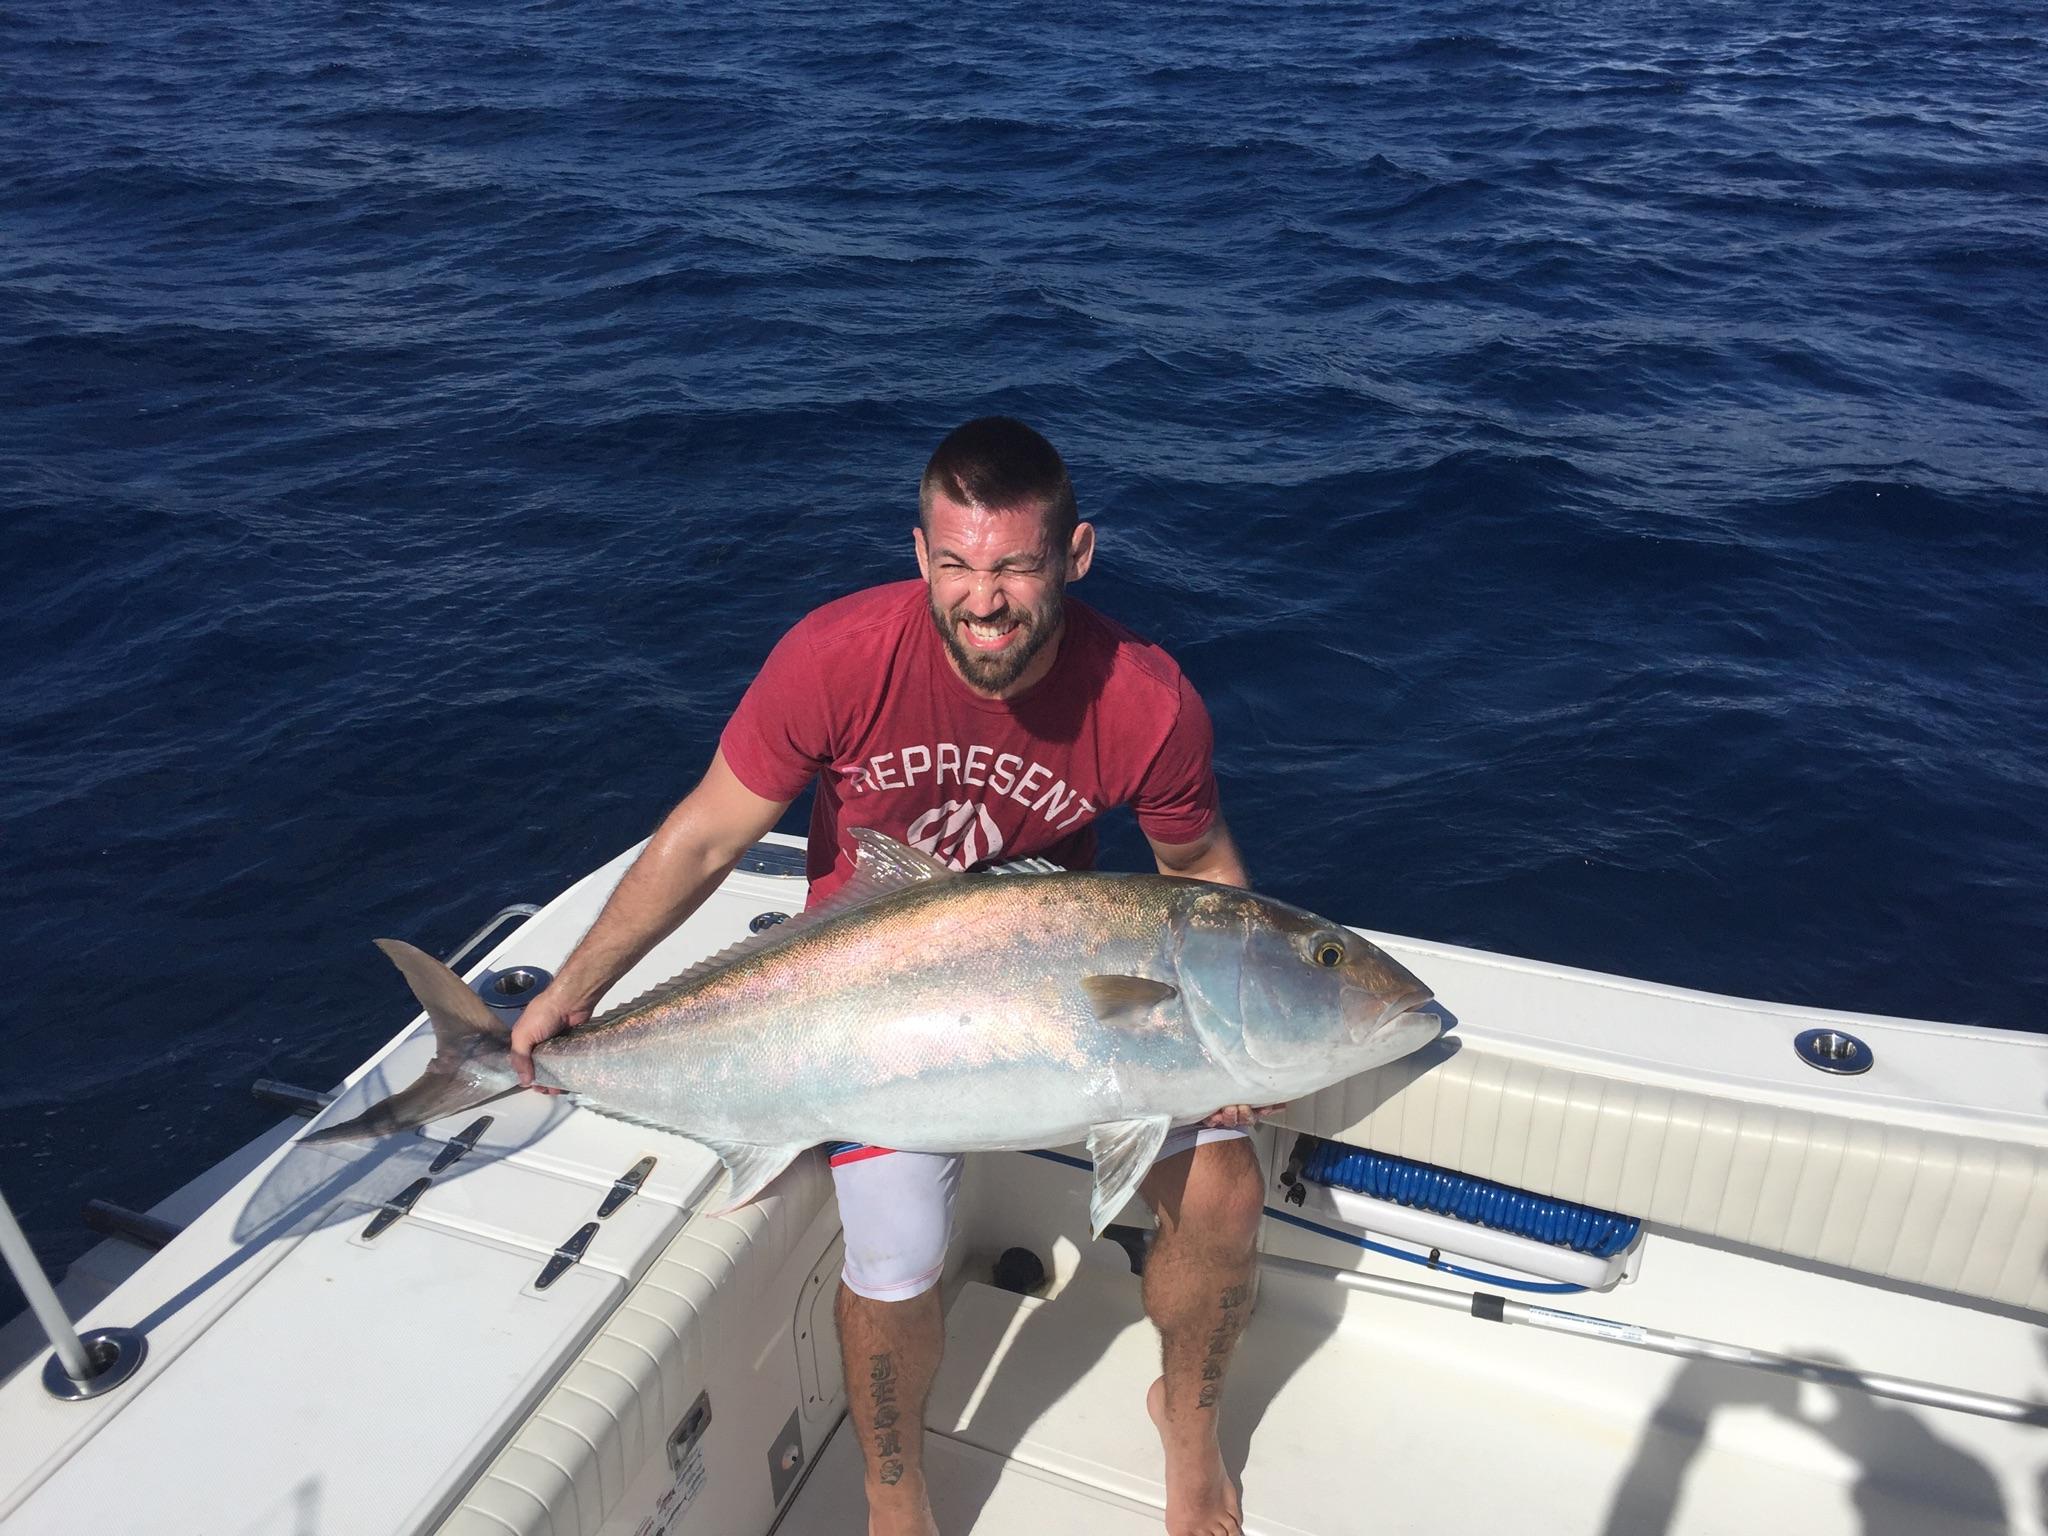 Beautiful amberjack catch 39 em all florida keys fishing for Florida keys fishing calendar